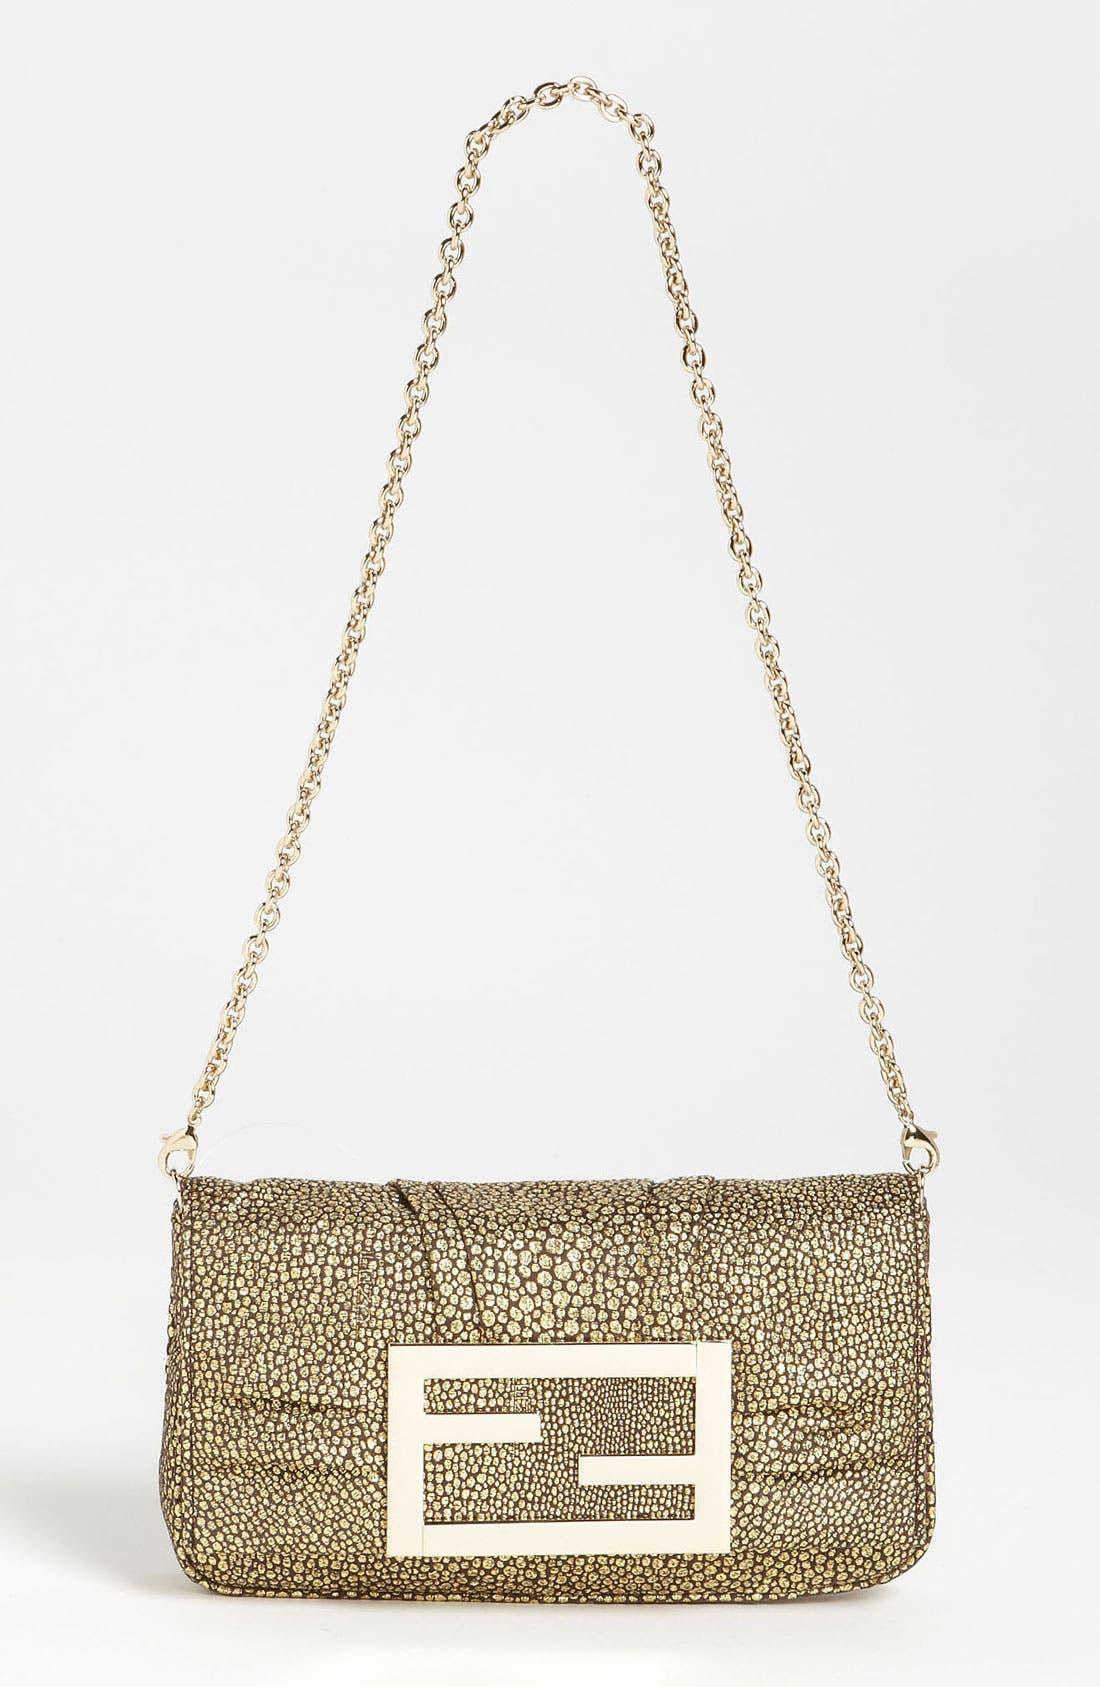 Alternate Image 1 Selected - Fendi 'Mia' Fabric Evening Bag